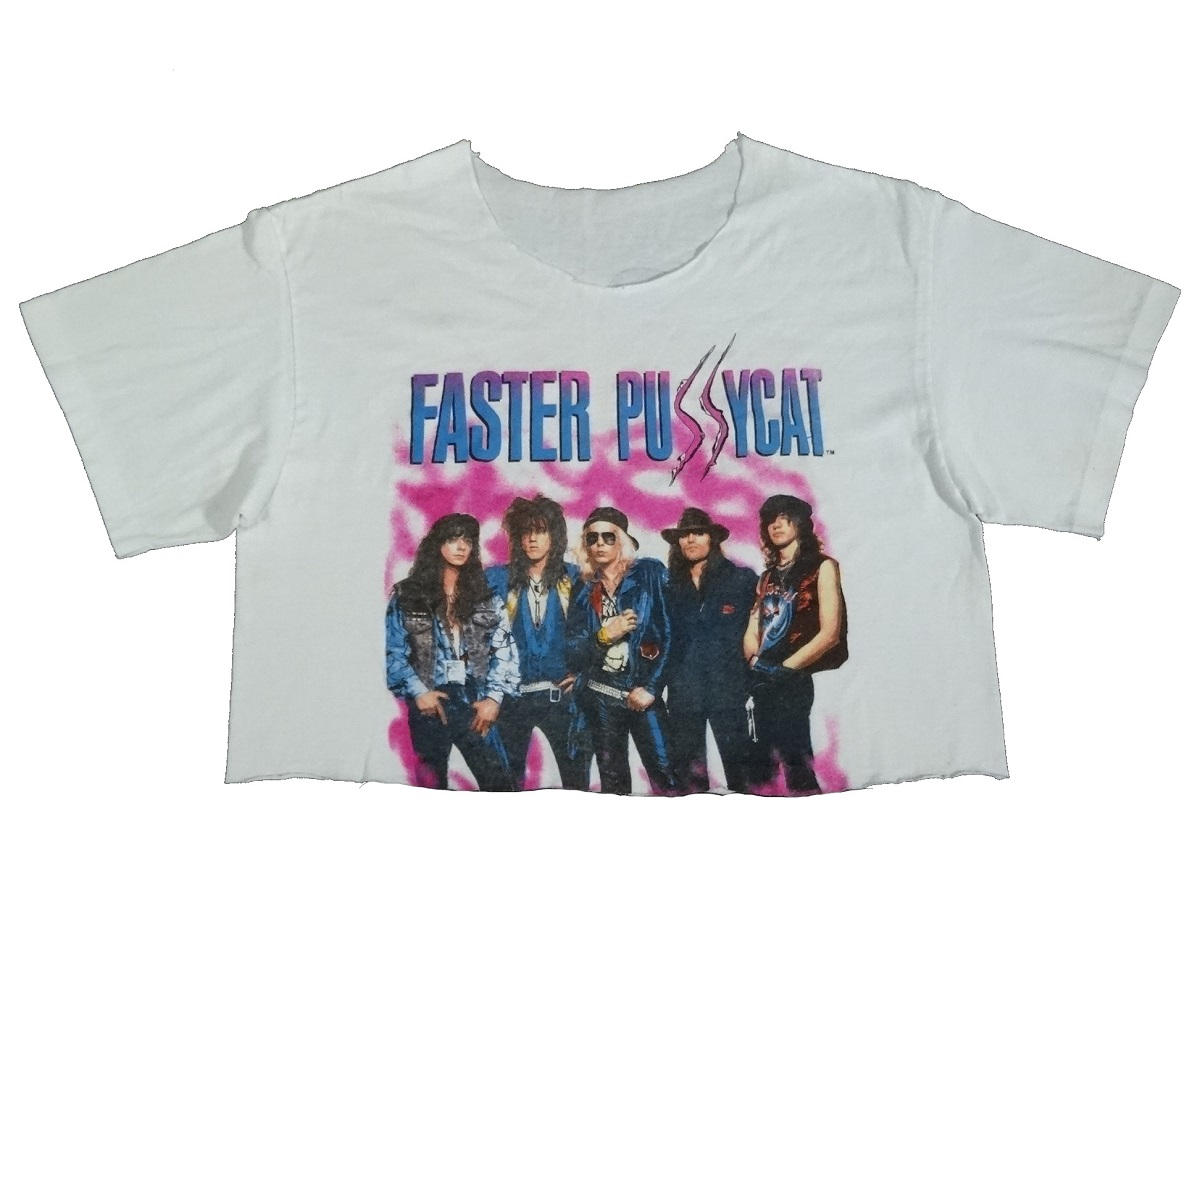 faster pussycat vintage 80s 1988 concert tour shirt front of shirt